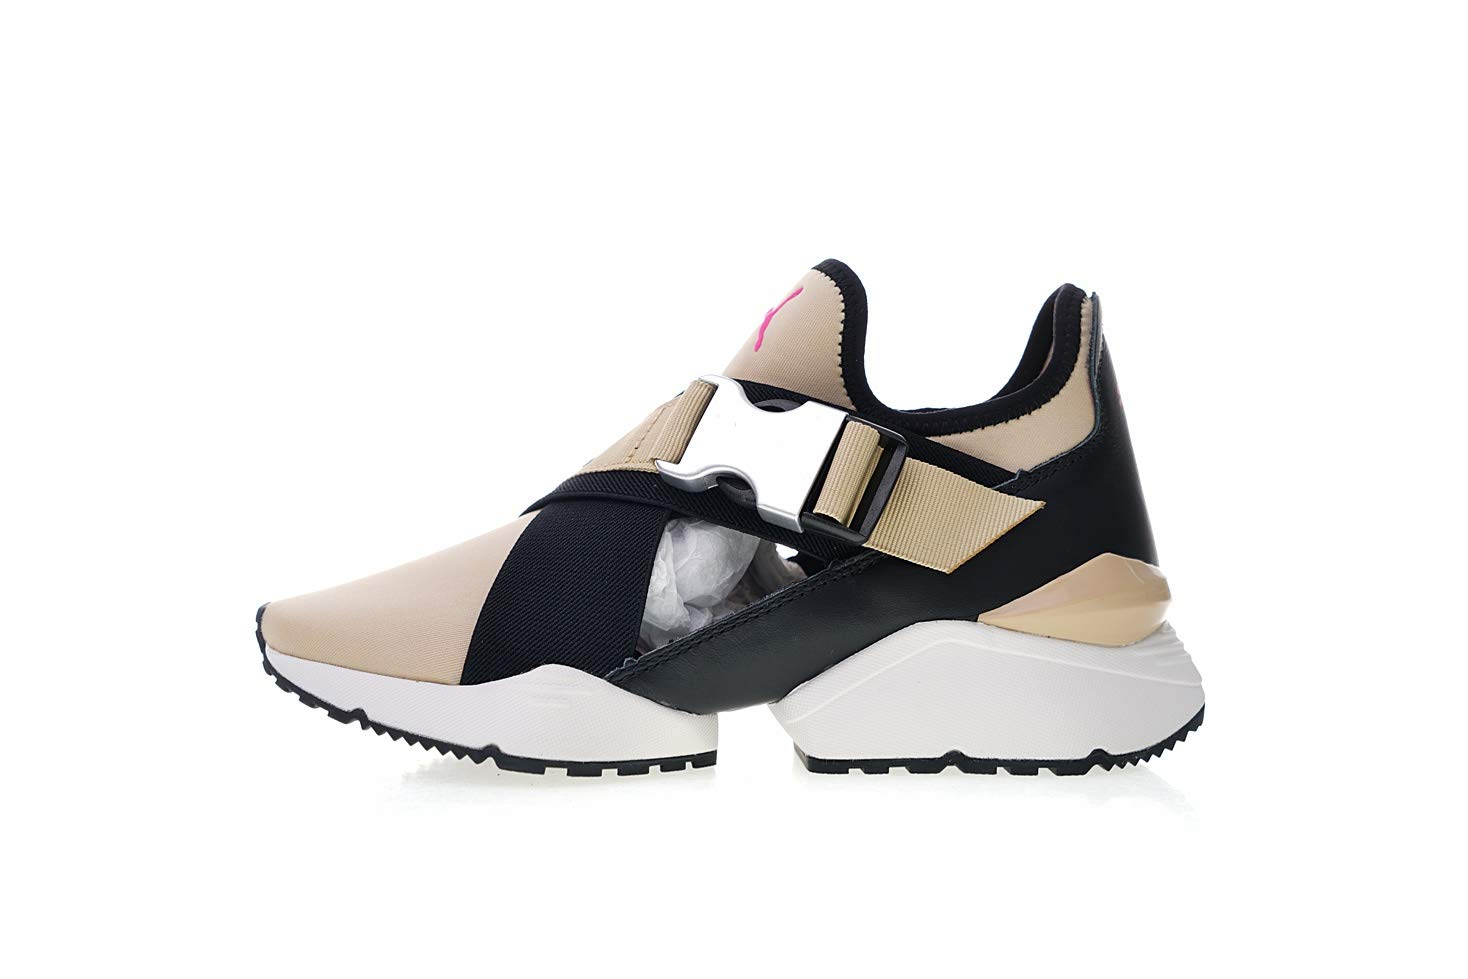 b271ea40 AONET Fashion Muse EOS Cut-Out Wmns Sneakers Cement (EU 37 ...